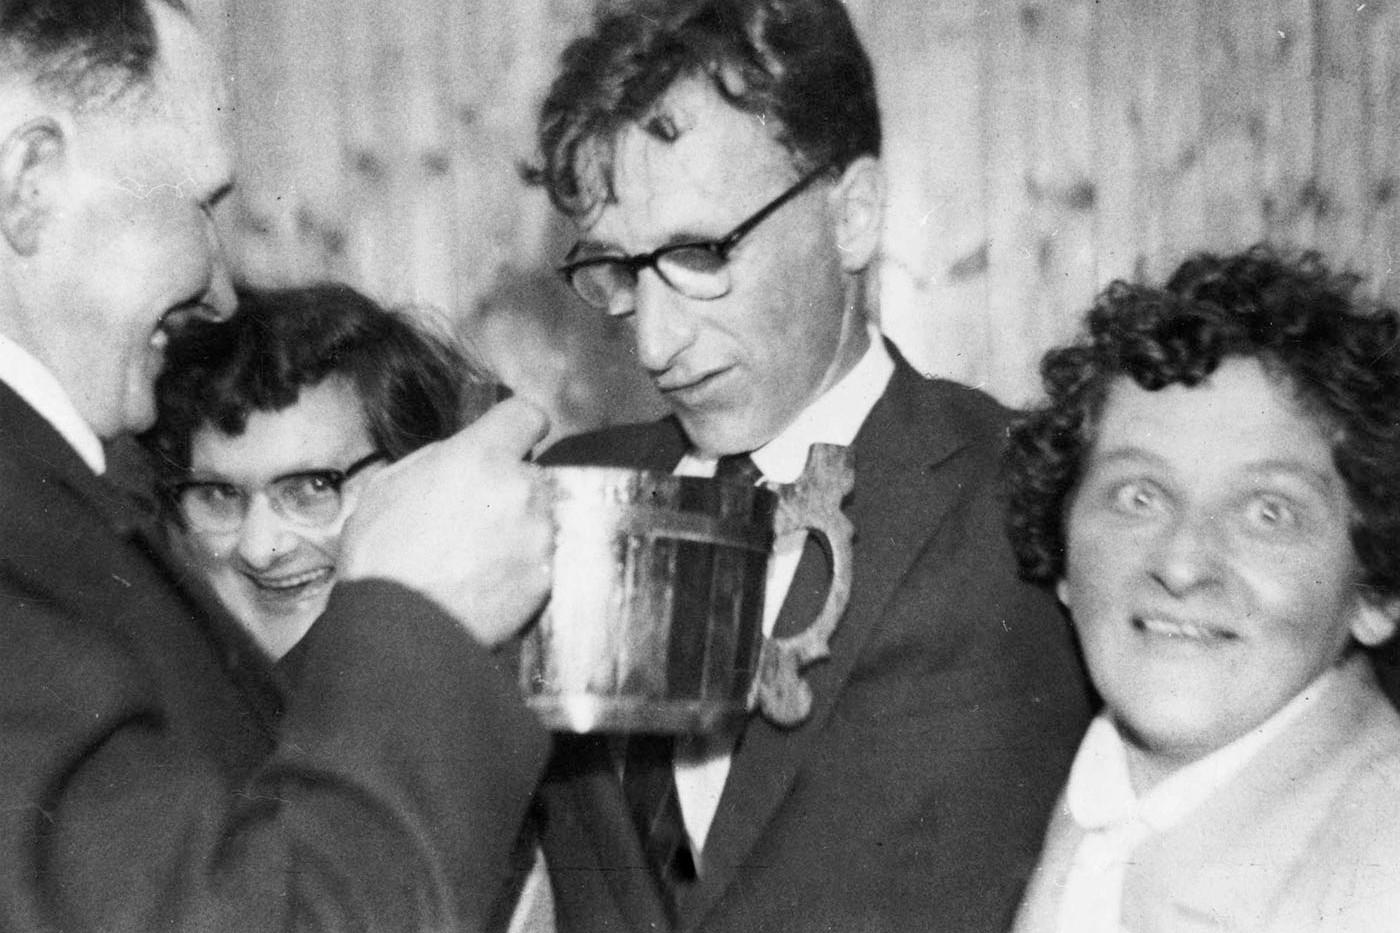 Wedding of Ronnie and Ethel Mowat of Ramray, Graemsay, c. 1960s